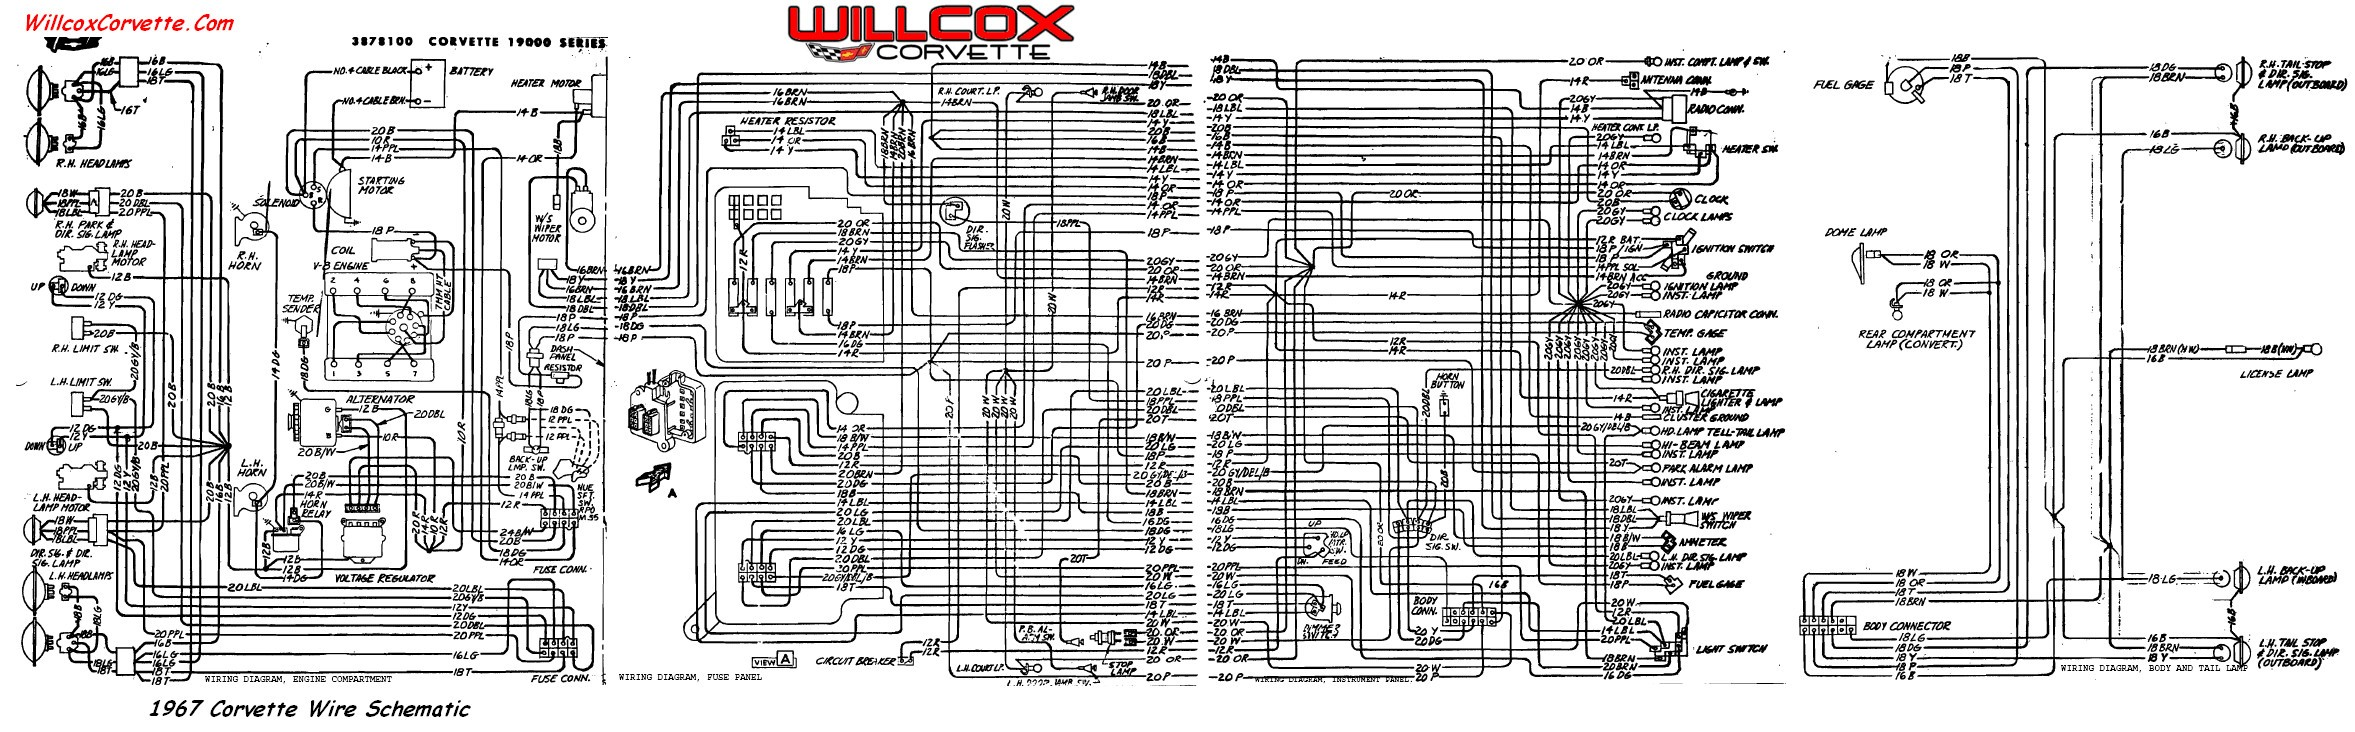 40 Corvette Wiring Diagram Pdf   Mini Split Wiring Diagram ...